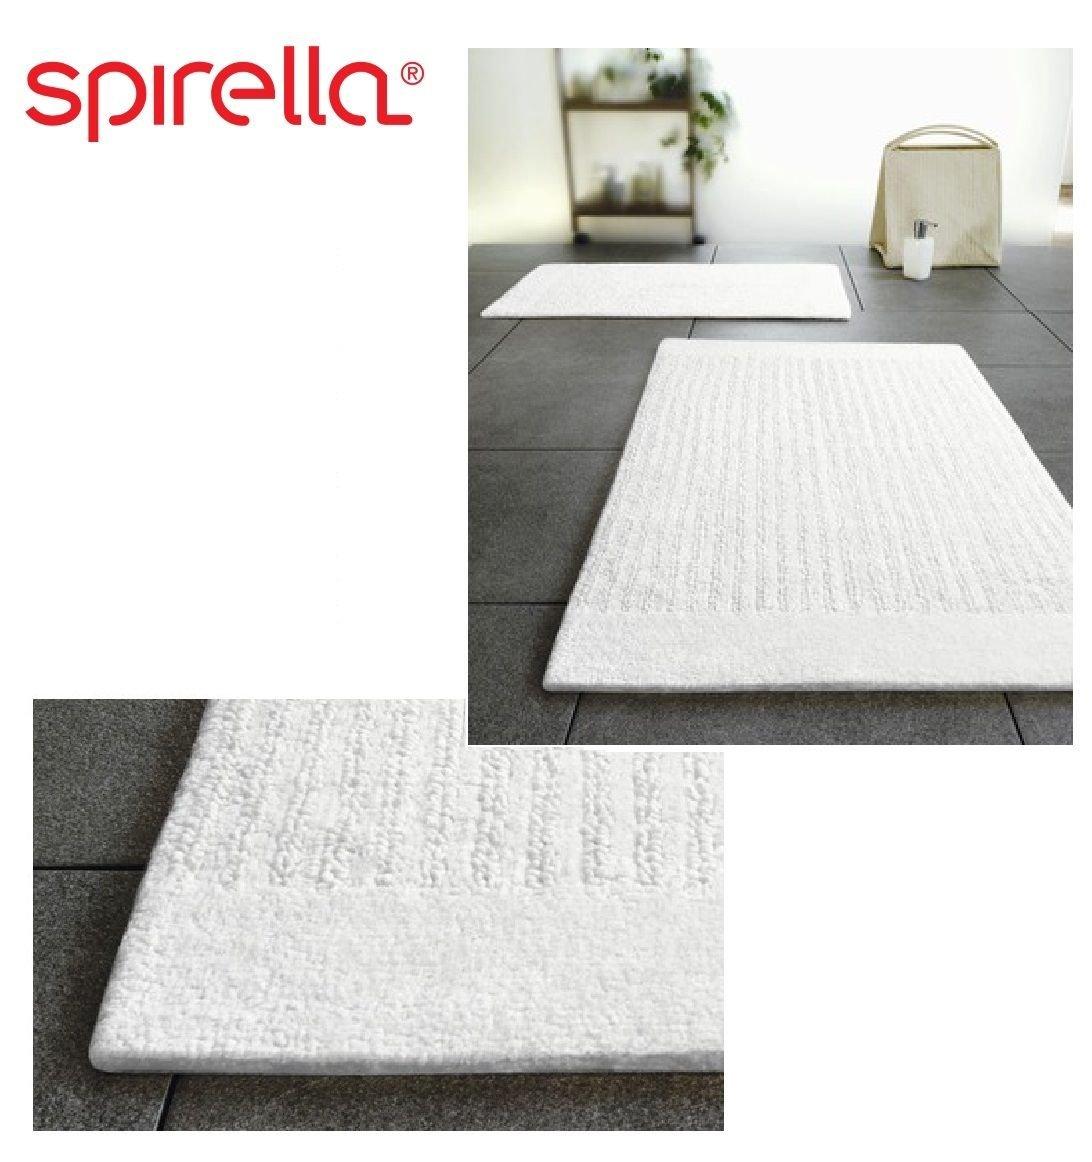 Amazon.com: Spirella Linea White Bath Rug Bath Mat Reversable 20x31 ...